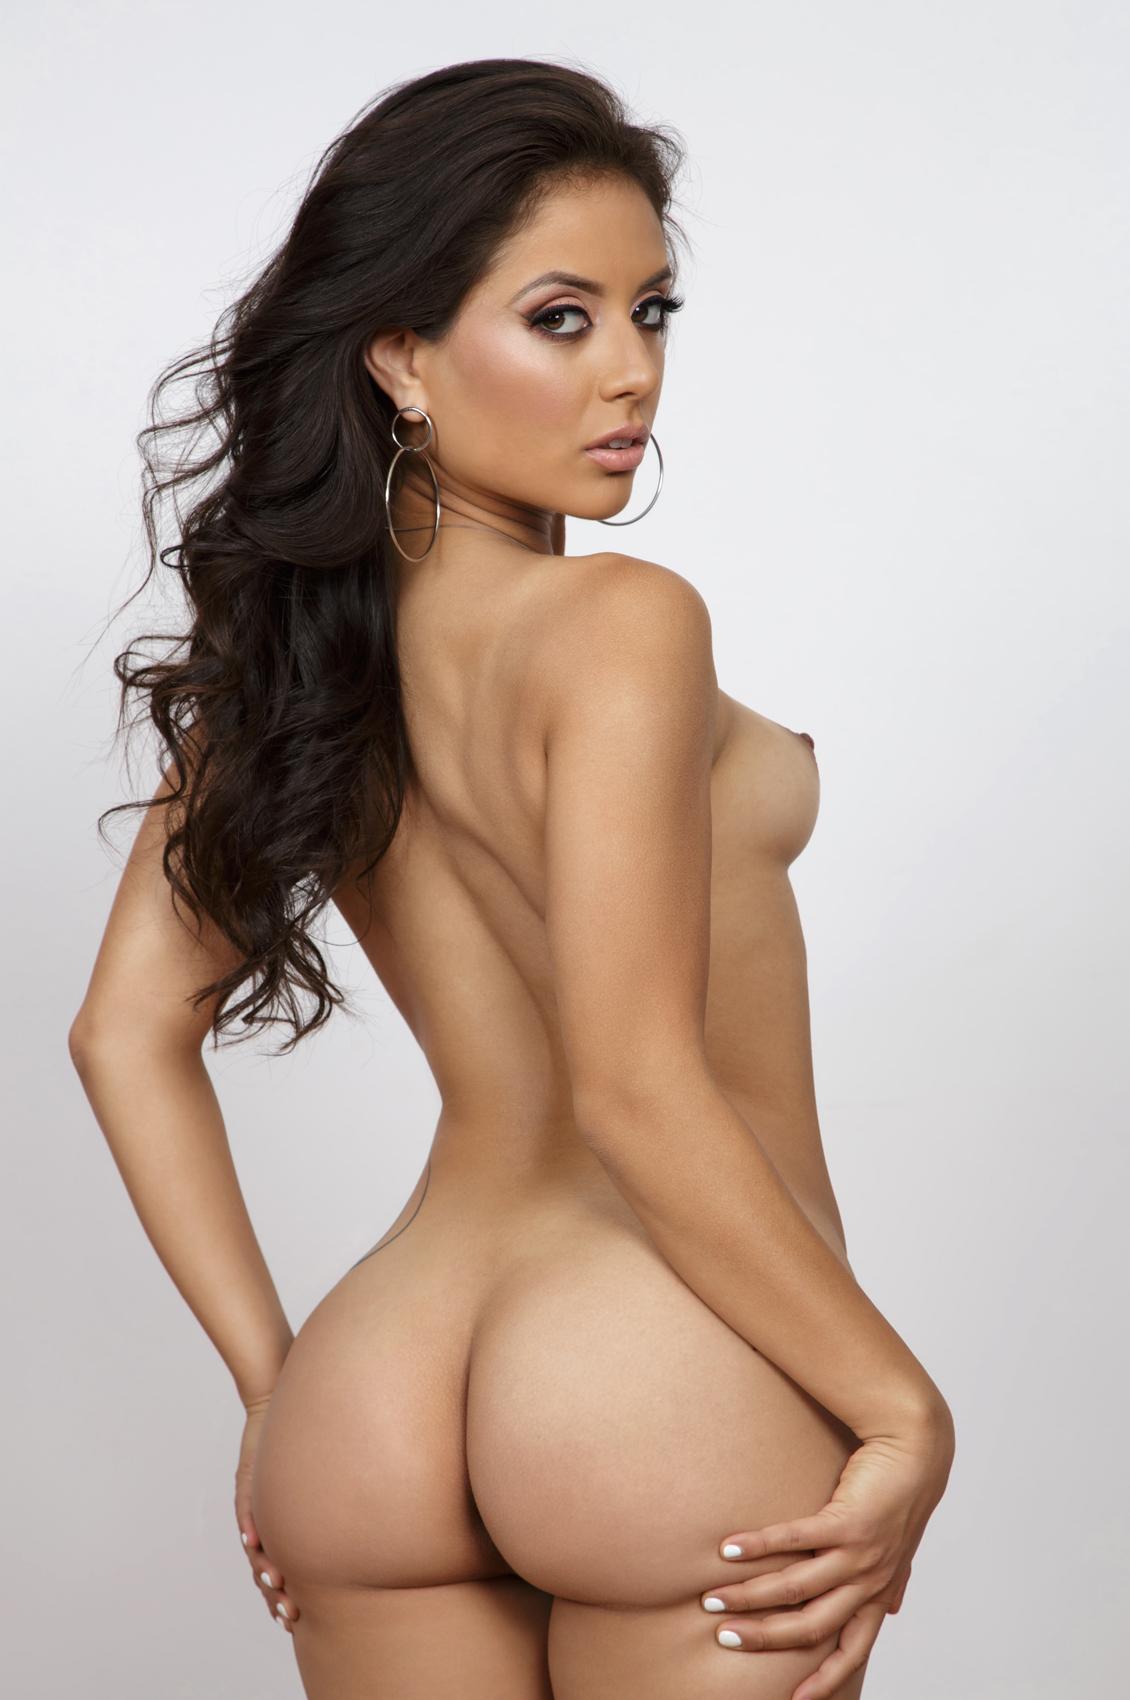 Jynx Maze's VR Porn Videos, Bio & Free Nude Pics